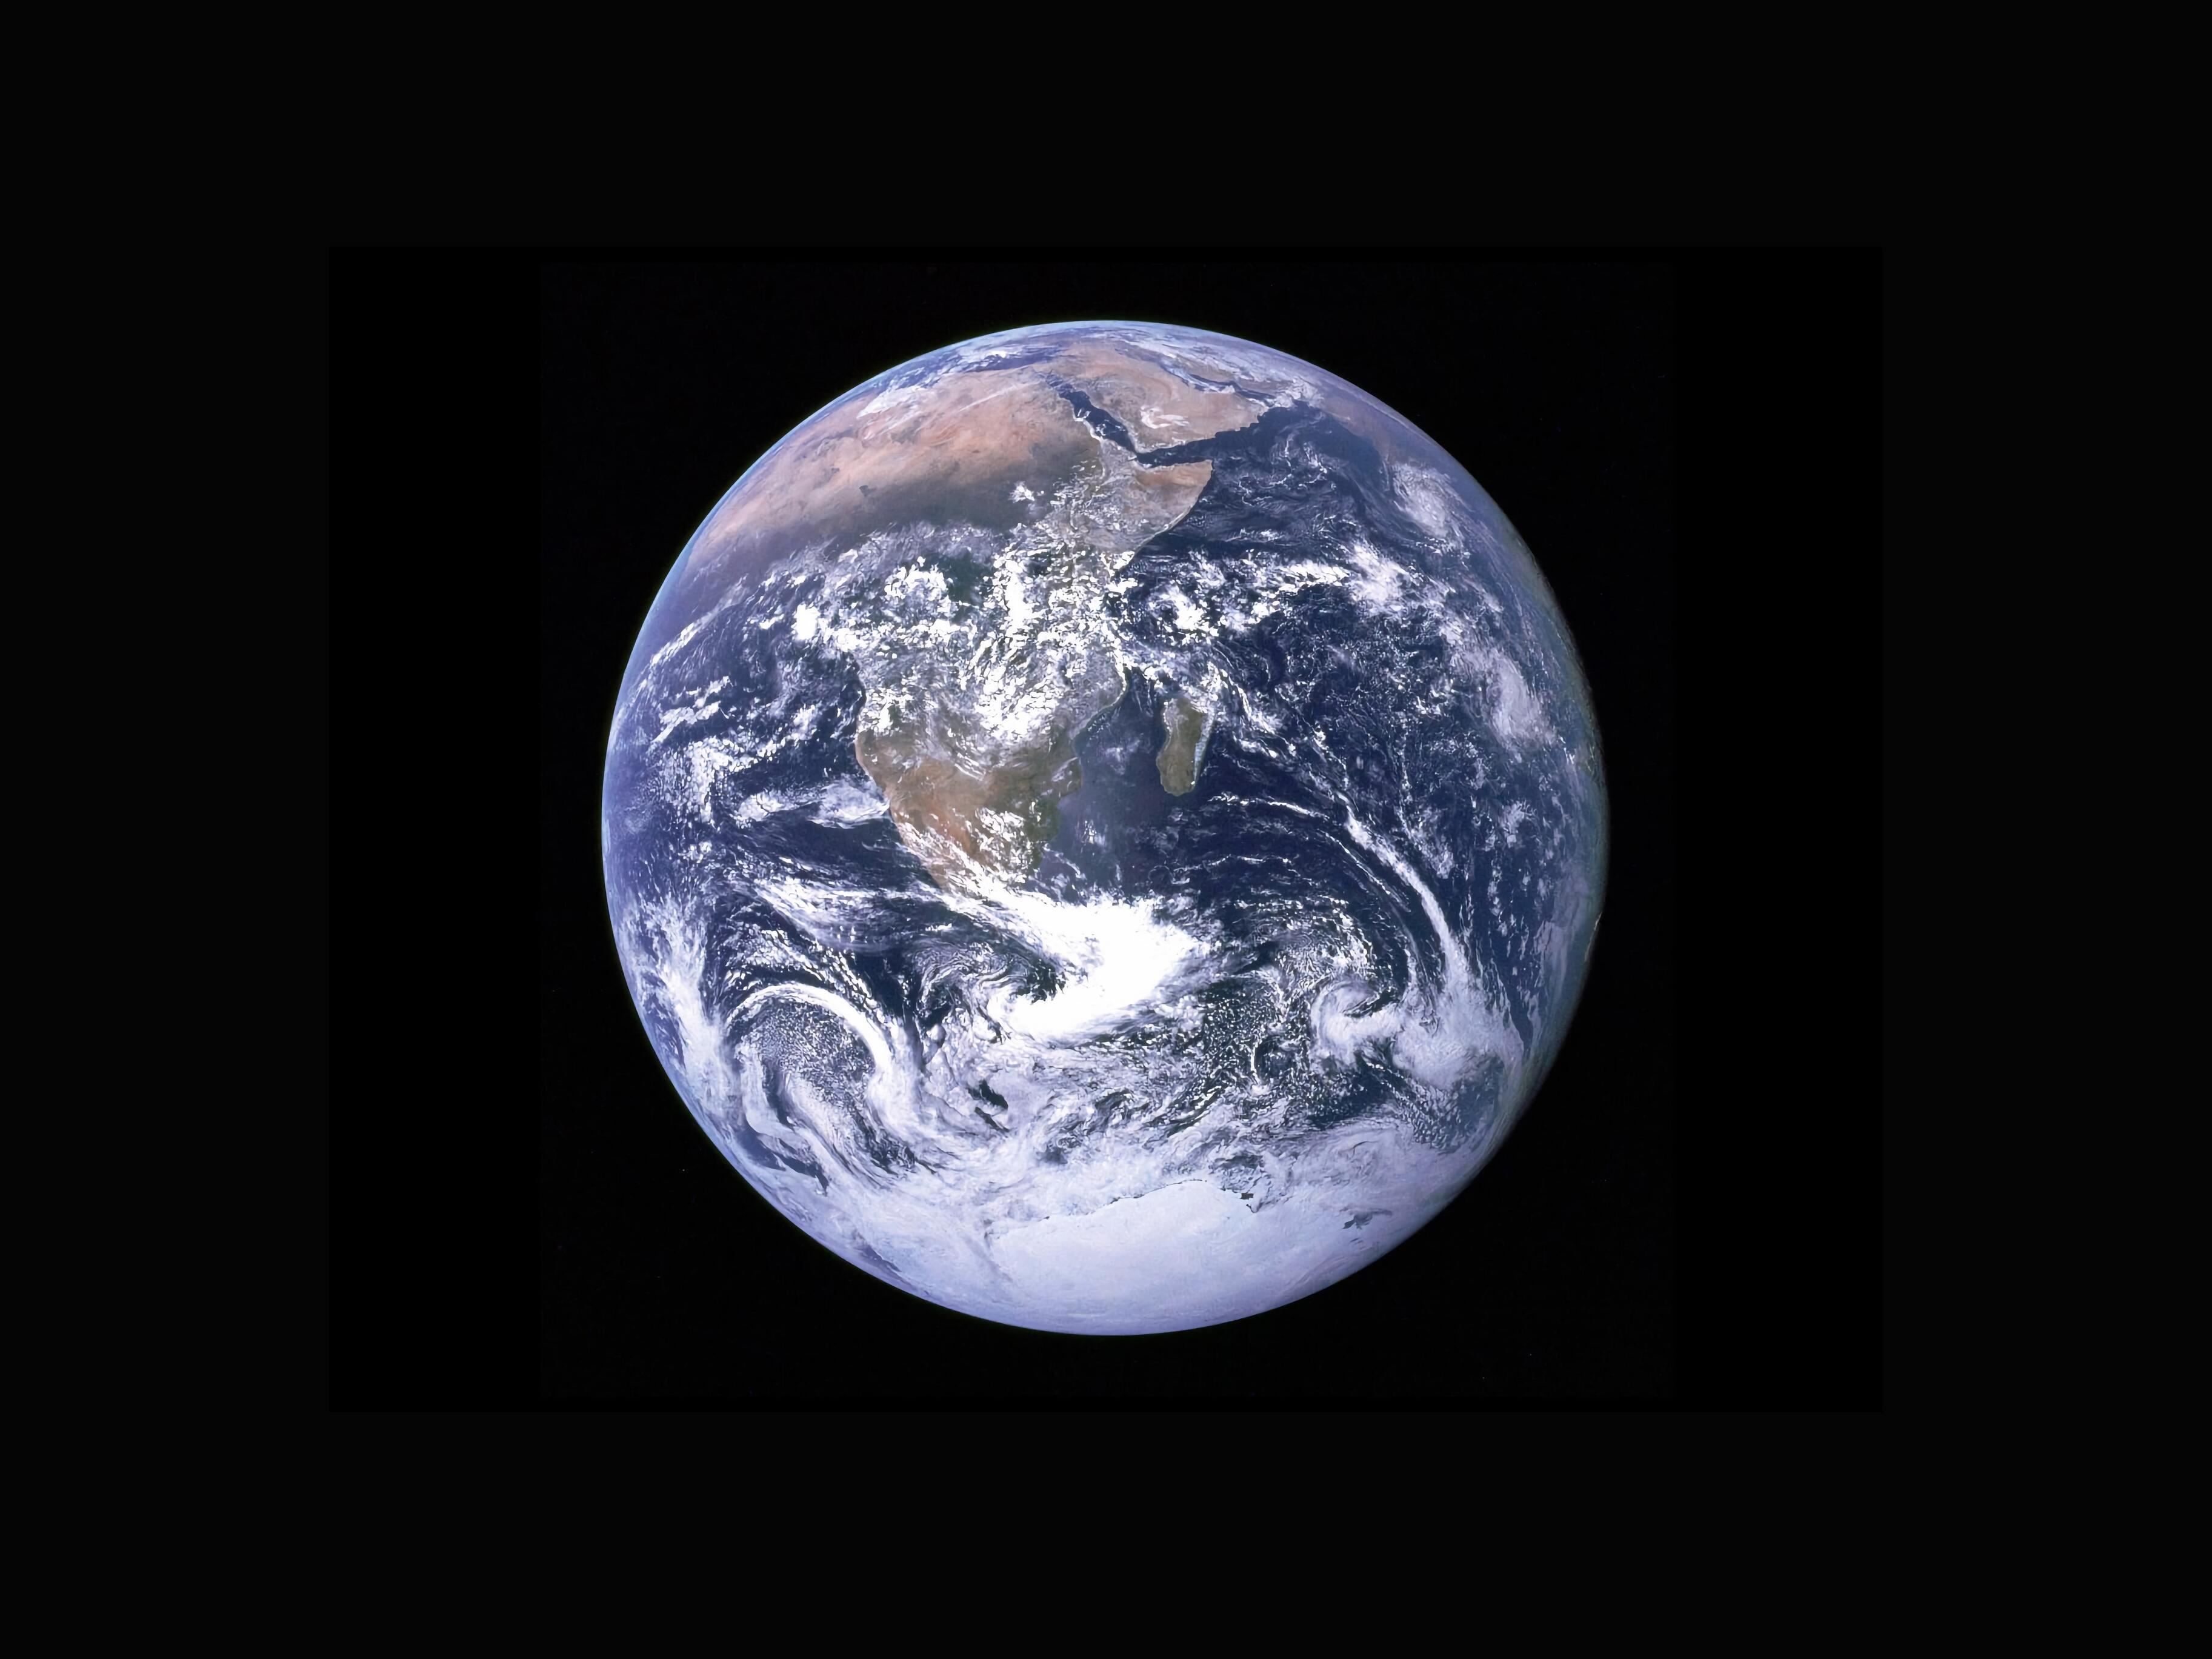 В ядре Земли нашли неизвестную структуру